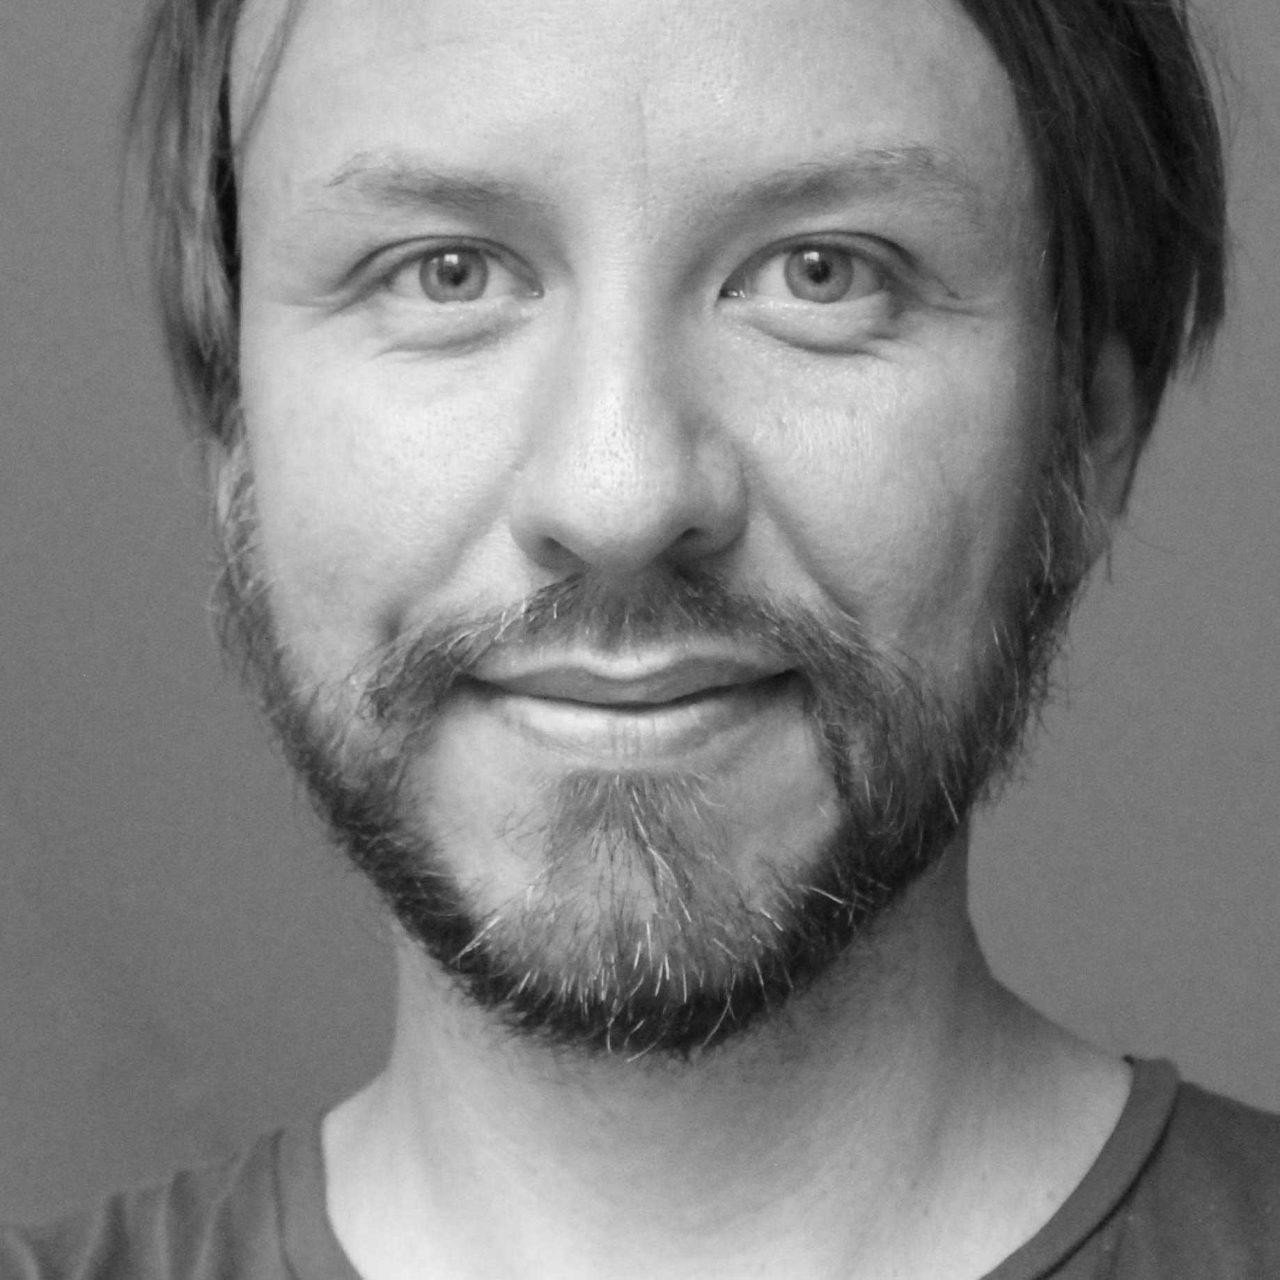 Animation Director, Henrik Malmgren